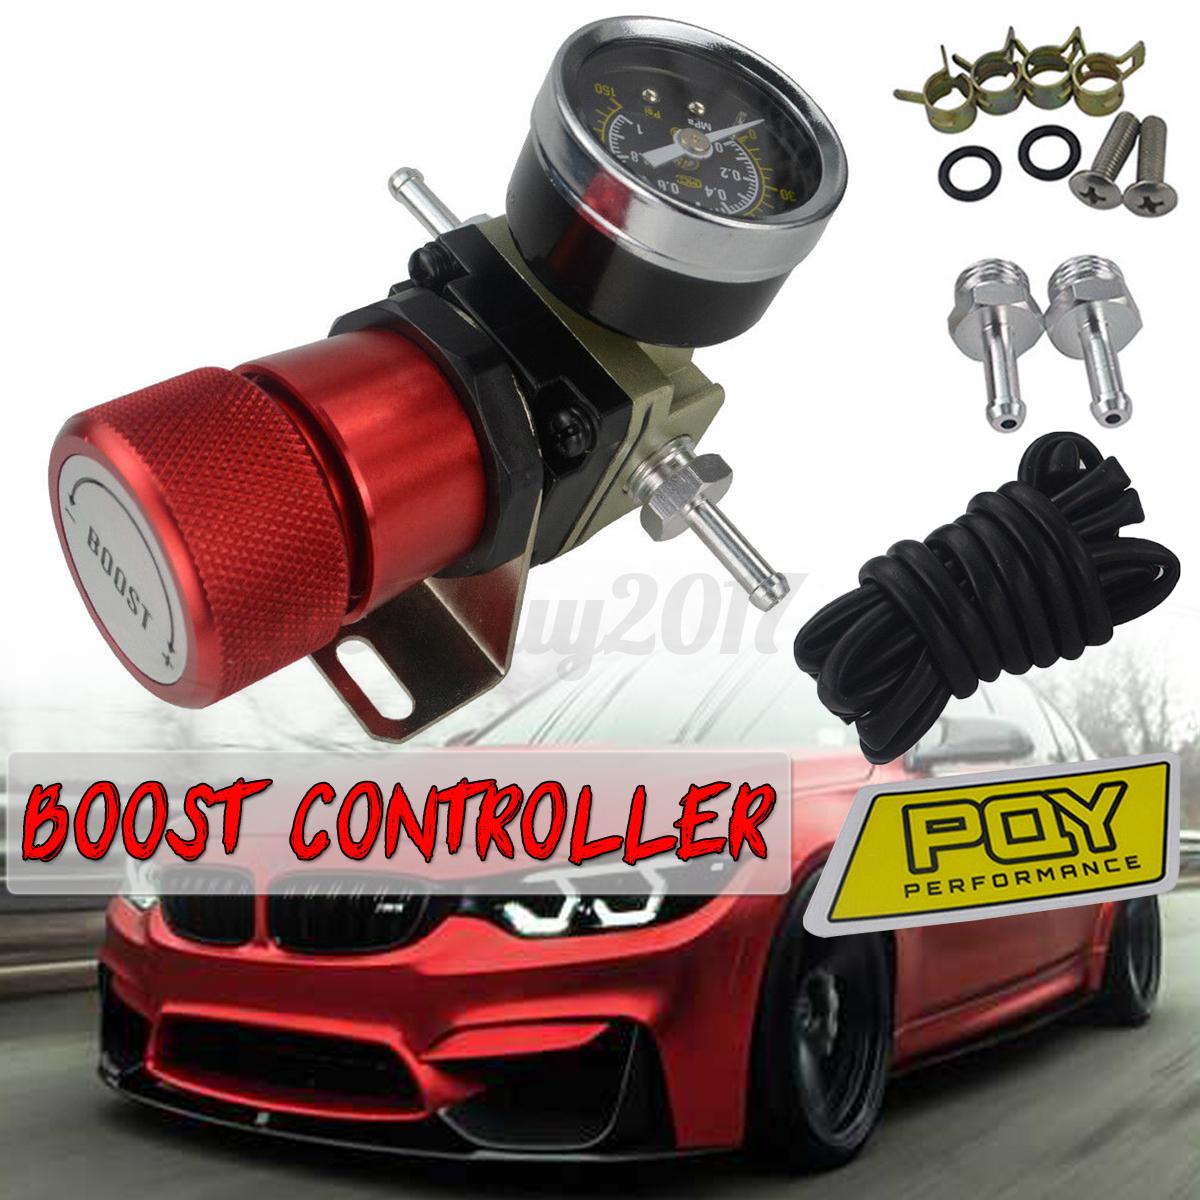 Universal Manual Turbo Boost Drucksteuerung mit Anzeige 1-150 PSI Rot Auto NEU